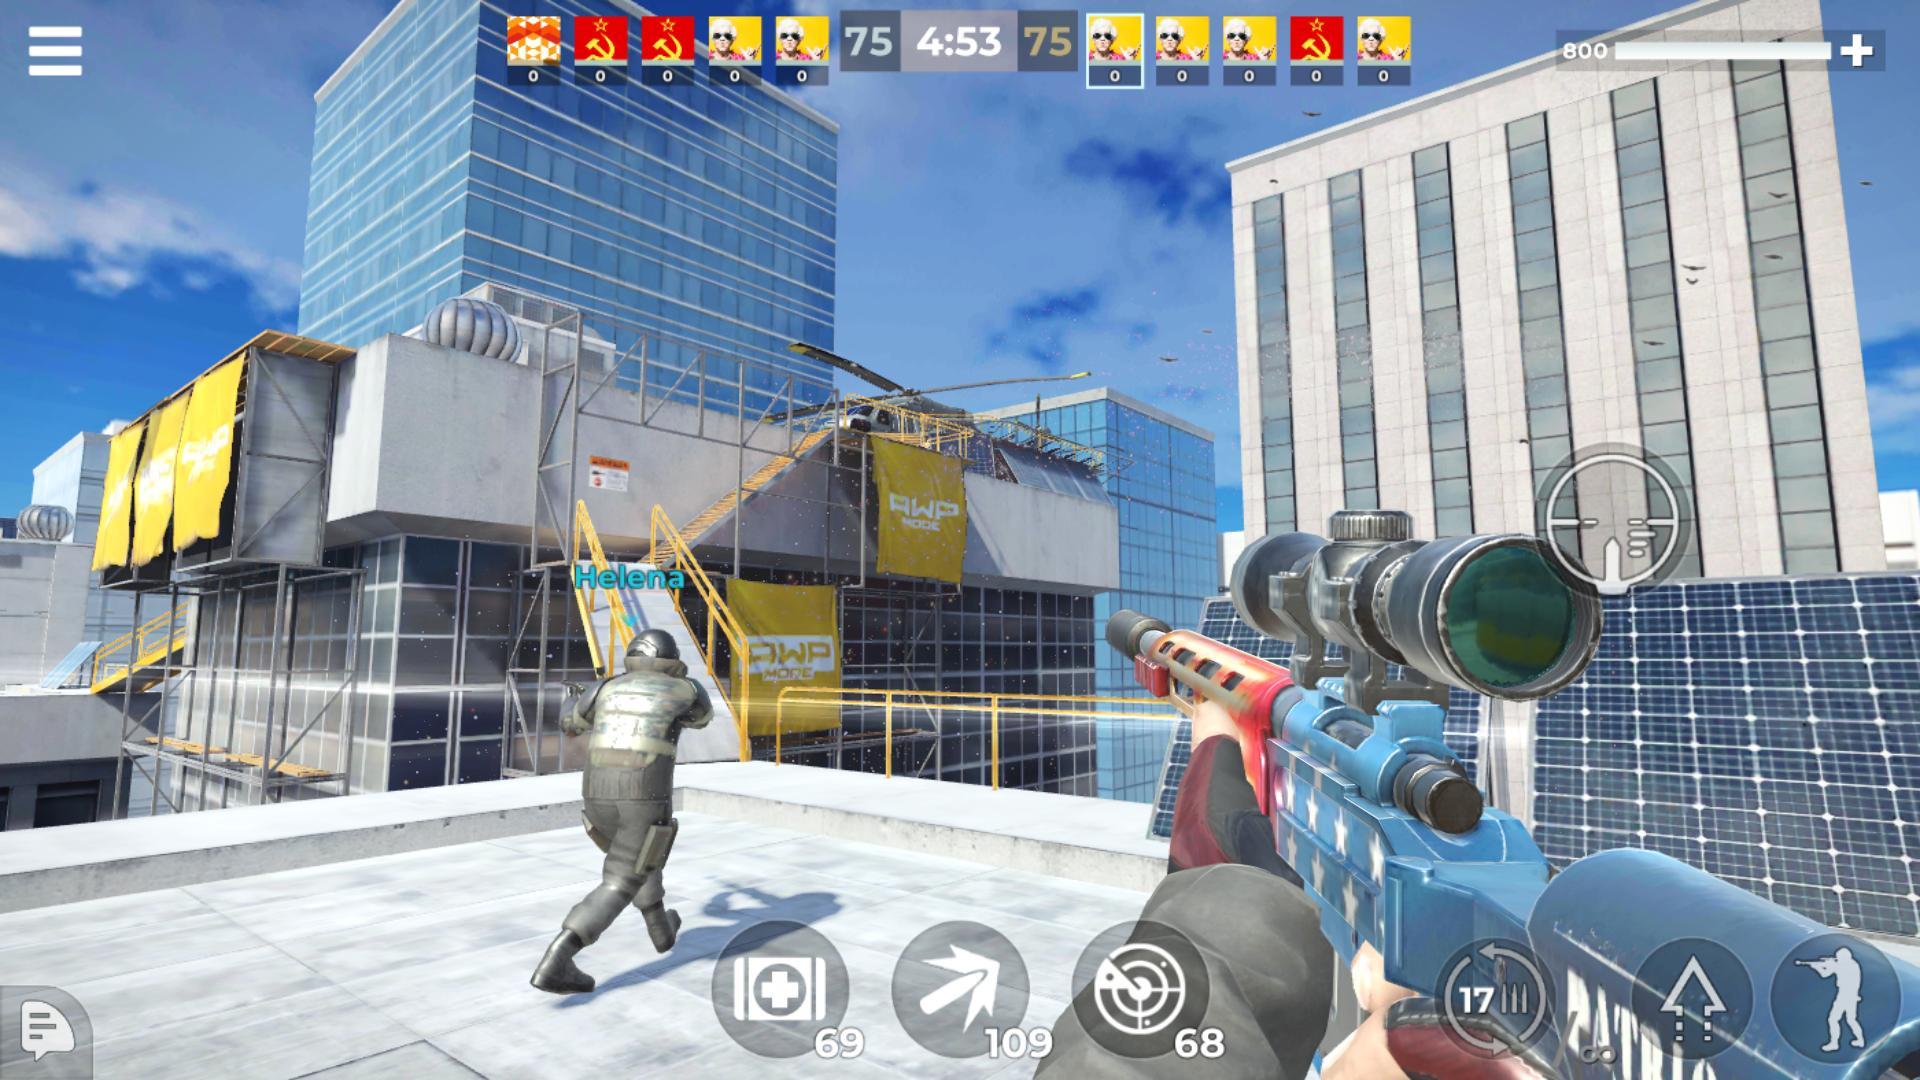 AWP Mode: Elite online 3D sniper action 1.6.1 Screenshot 1